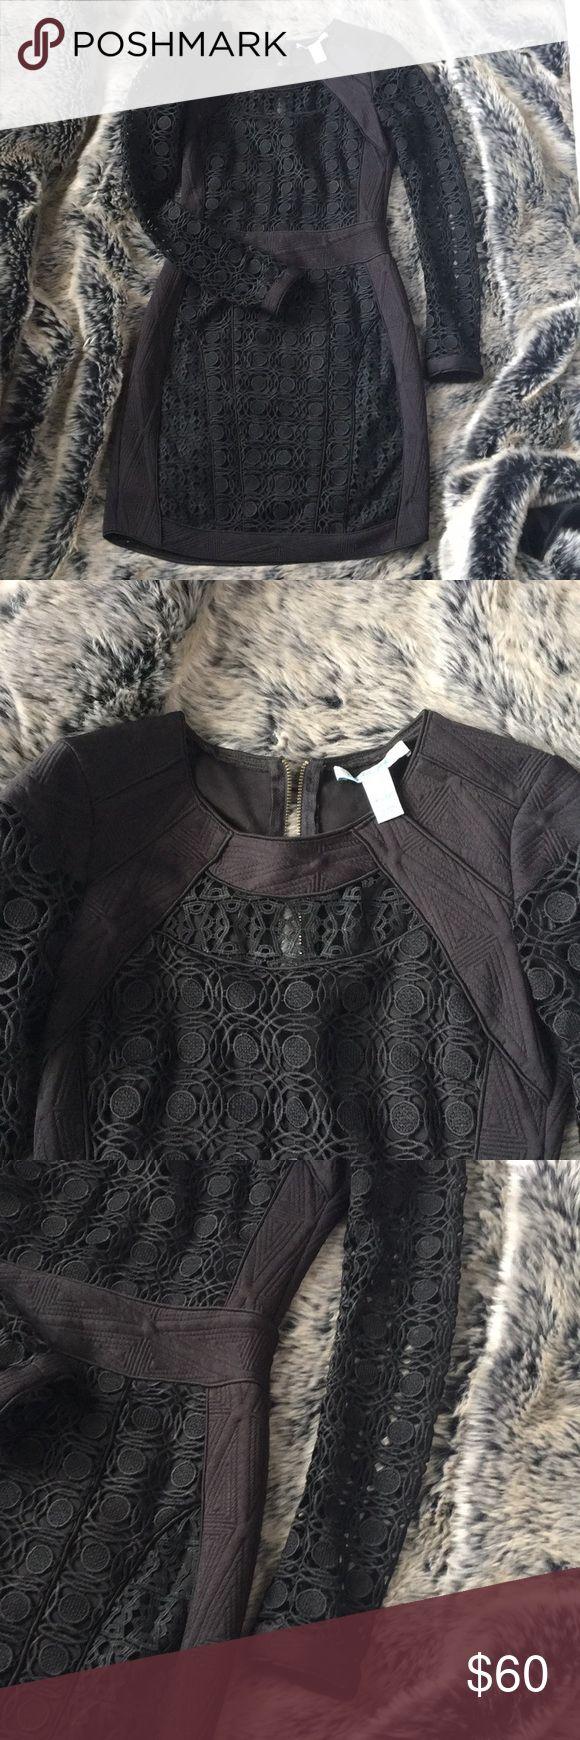 Charlie Jade Black Dress Size XS Charlie Jade Black Dress Size XS. Worn Once. Excellent condition. Charlie Jade Dresses